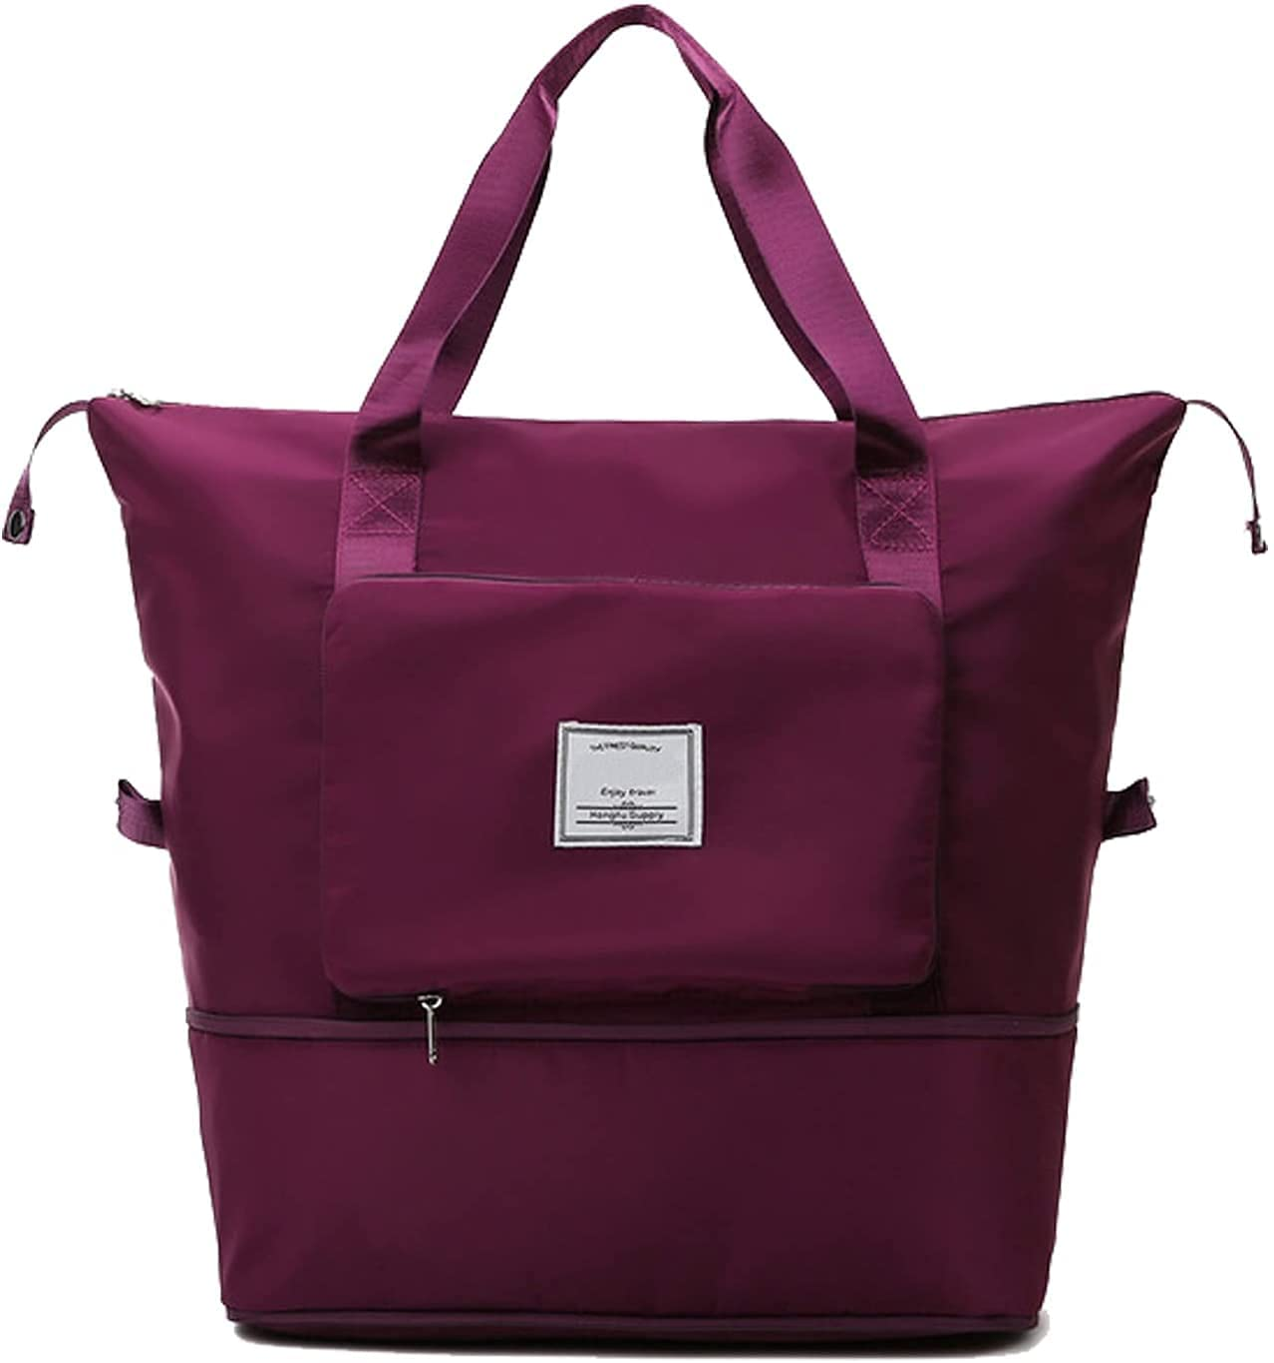 Large Capacity Max 64% OFF Spasm price Folding Travel Bag Portable Waterproo Lightweight